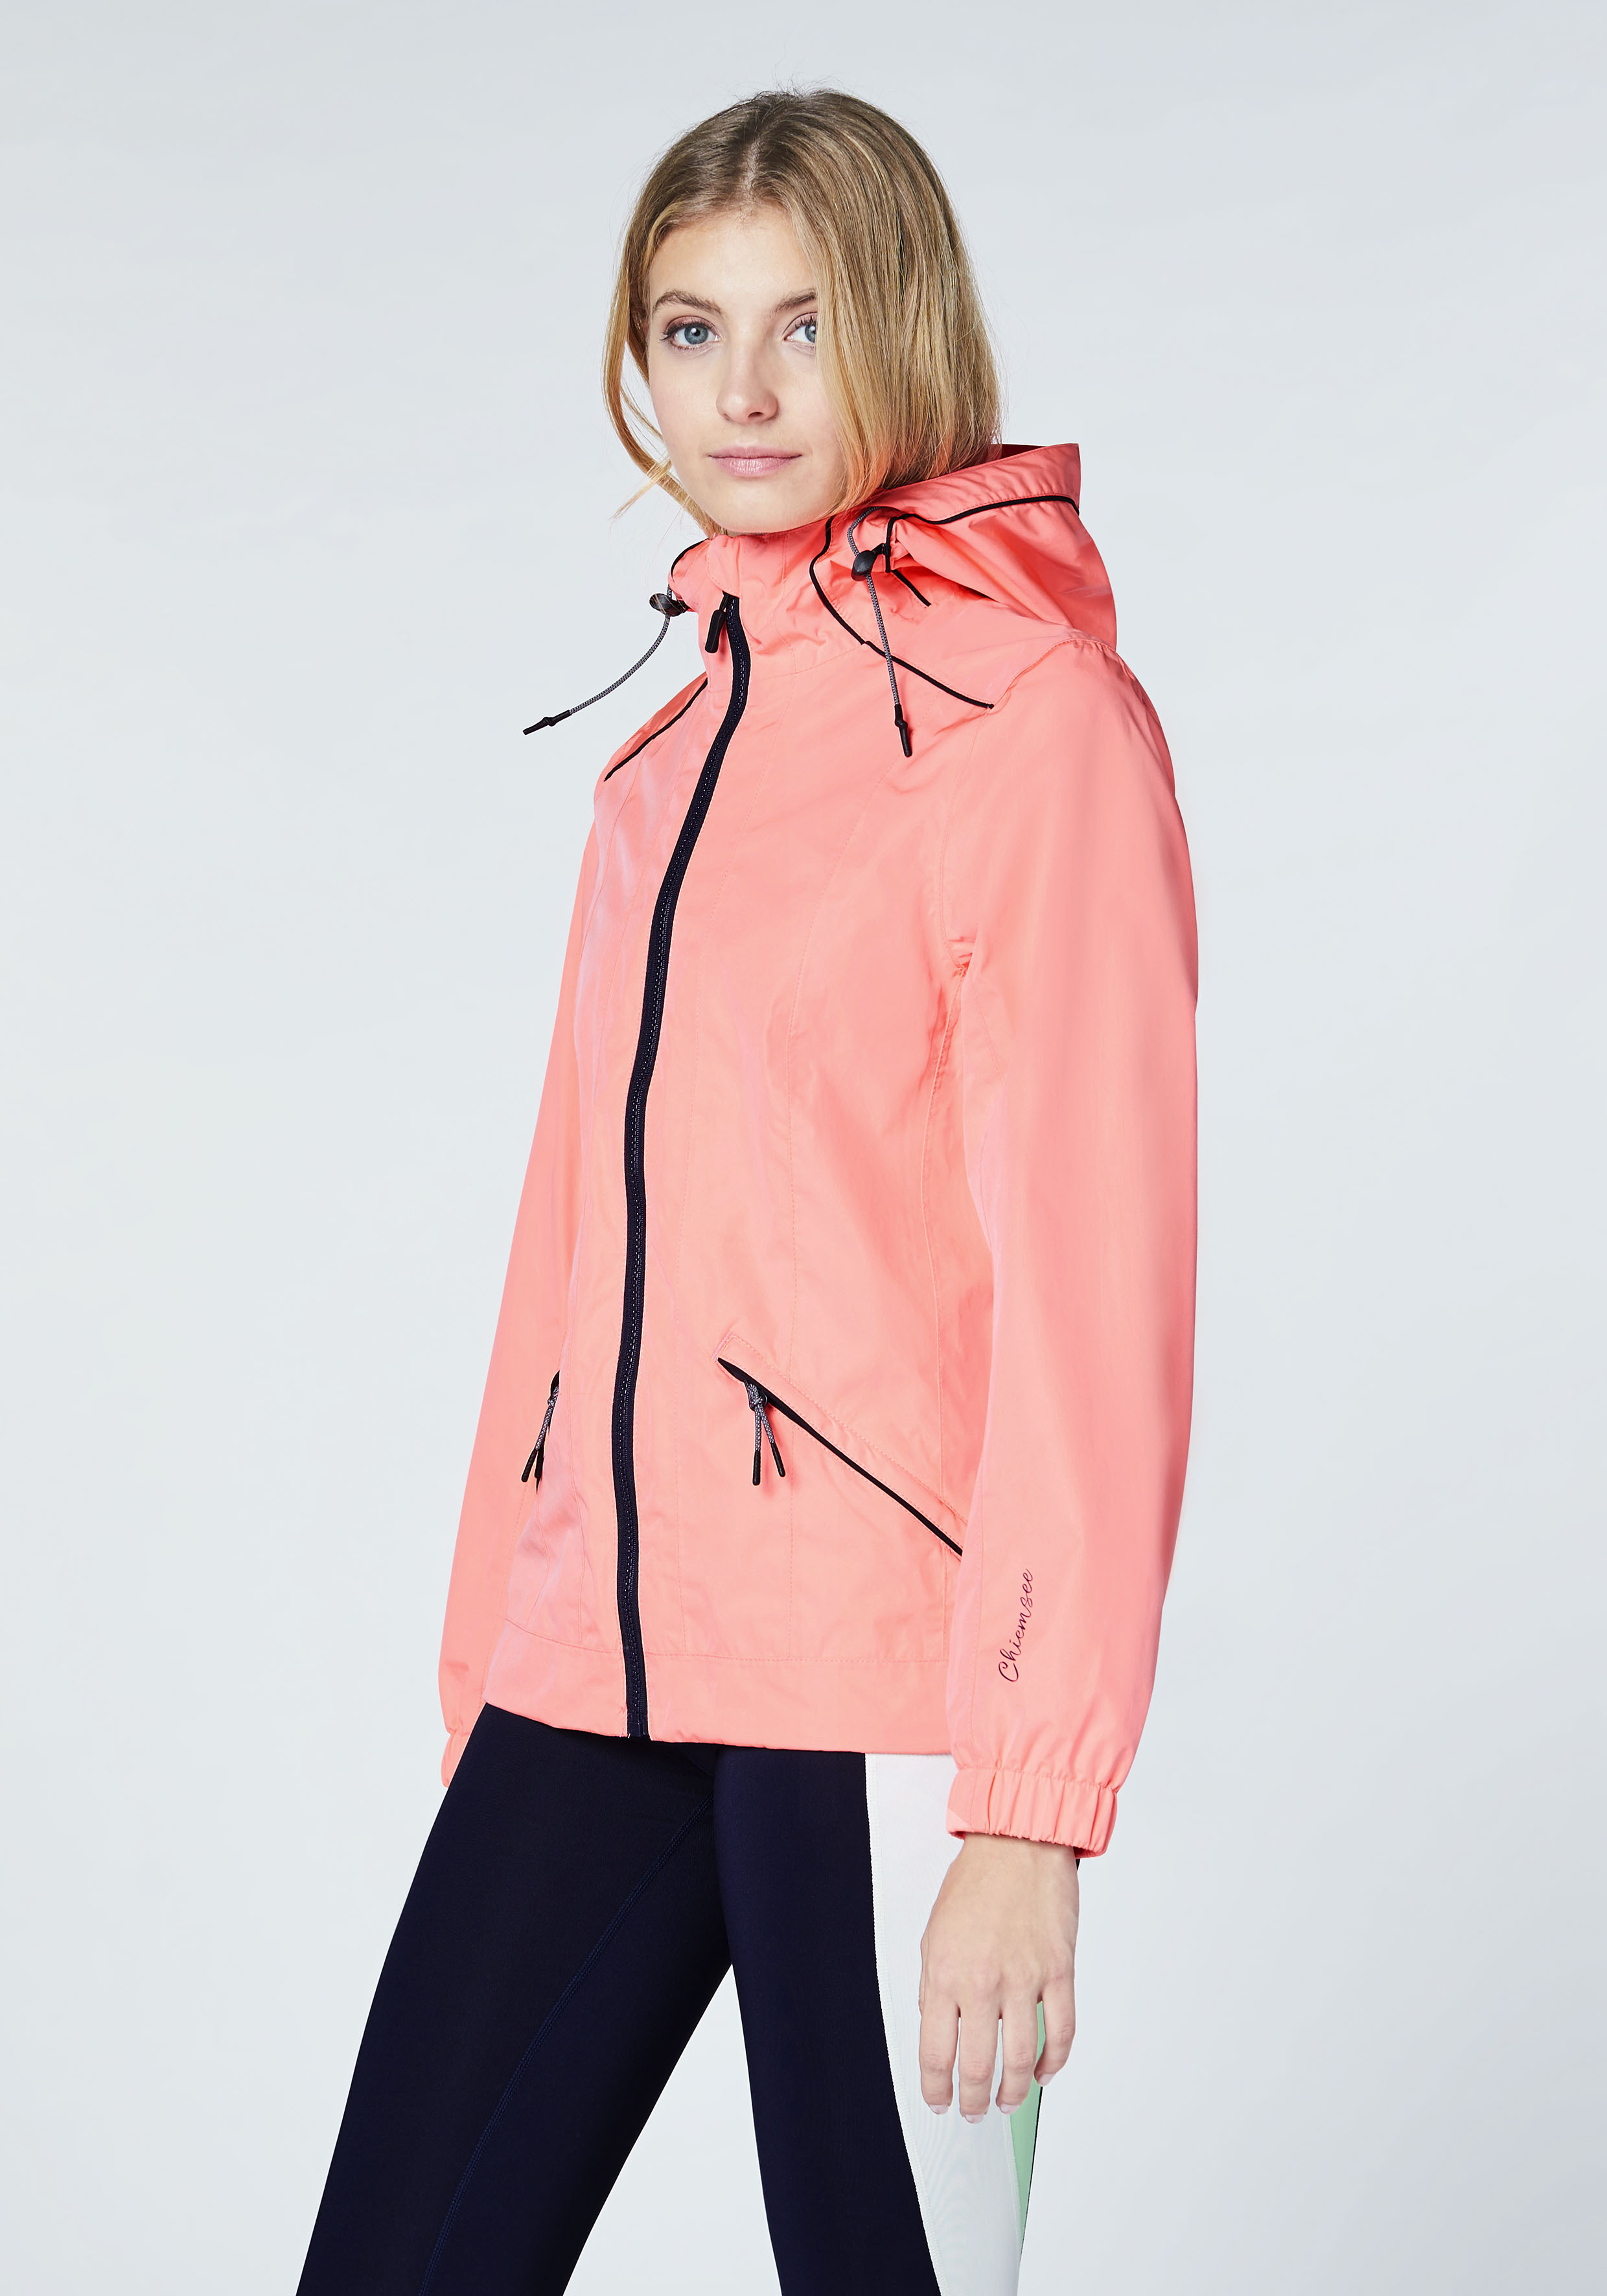 chiemsee -  Regenjacke  Regenjacke für Damen